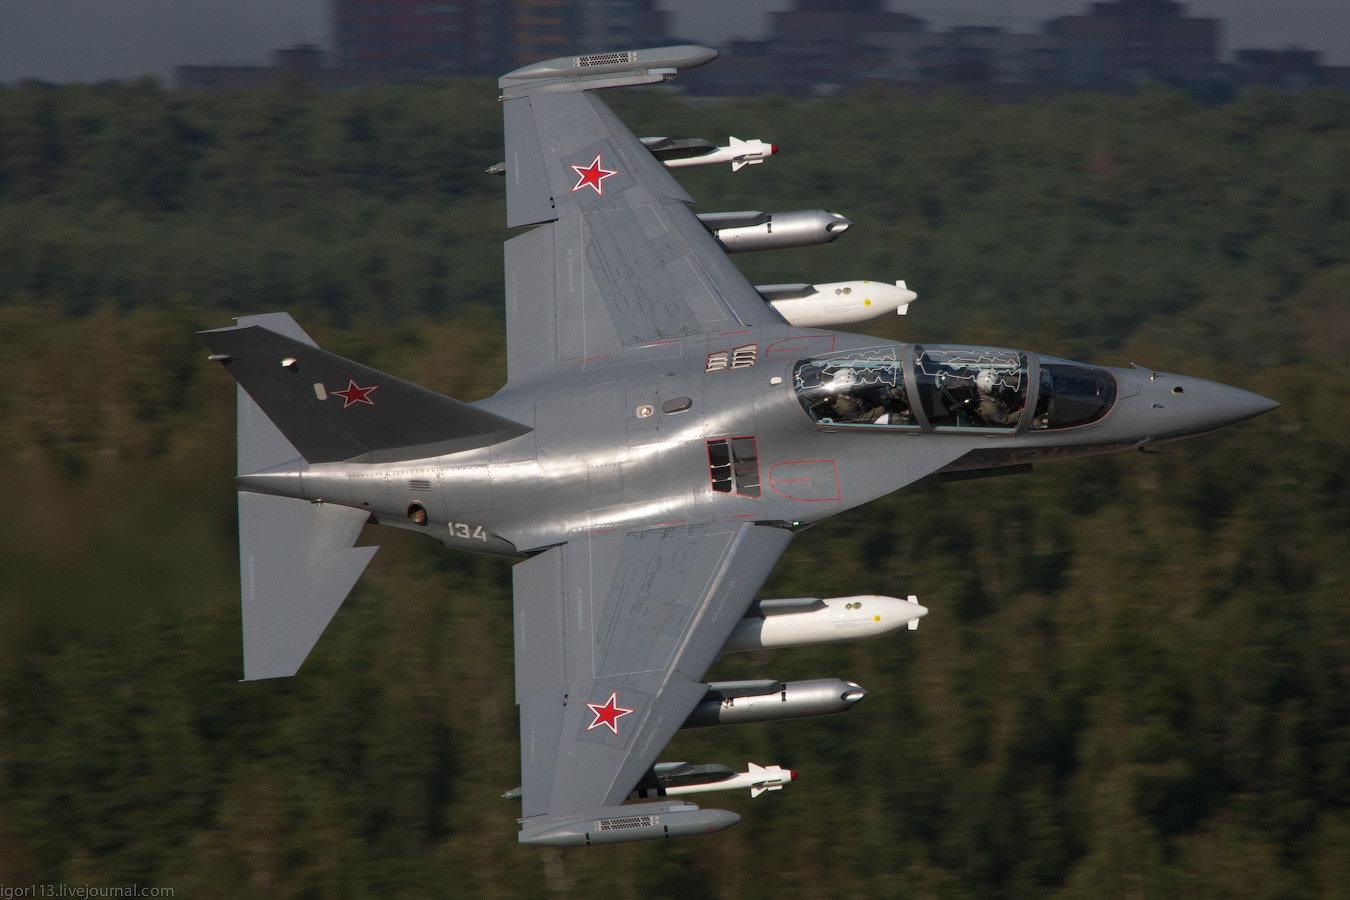 Yakovlev Yak-130 em demanda no mercado internacional